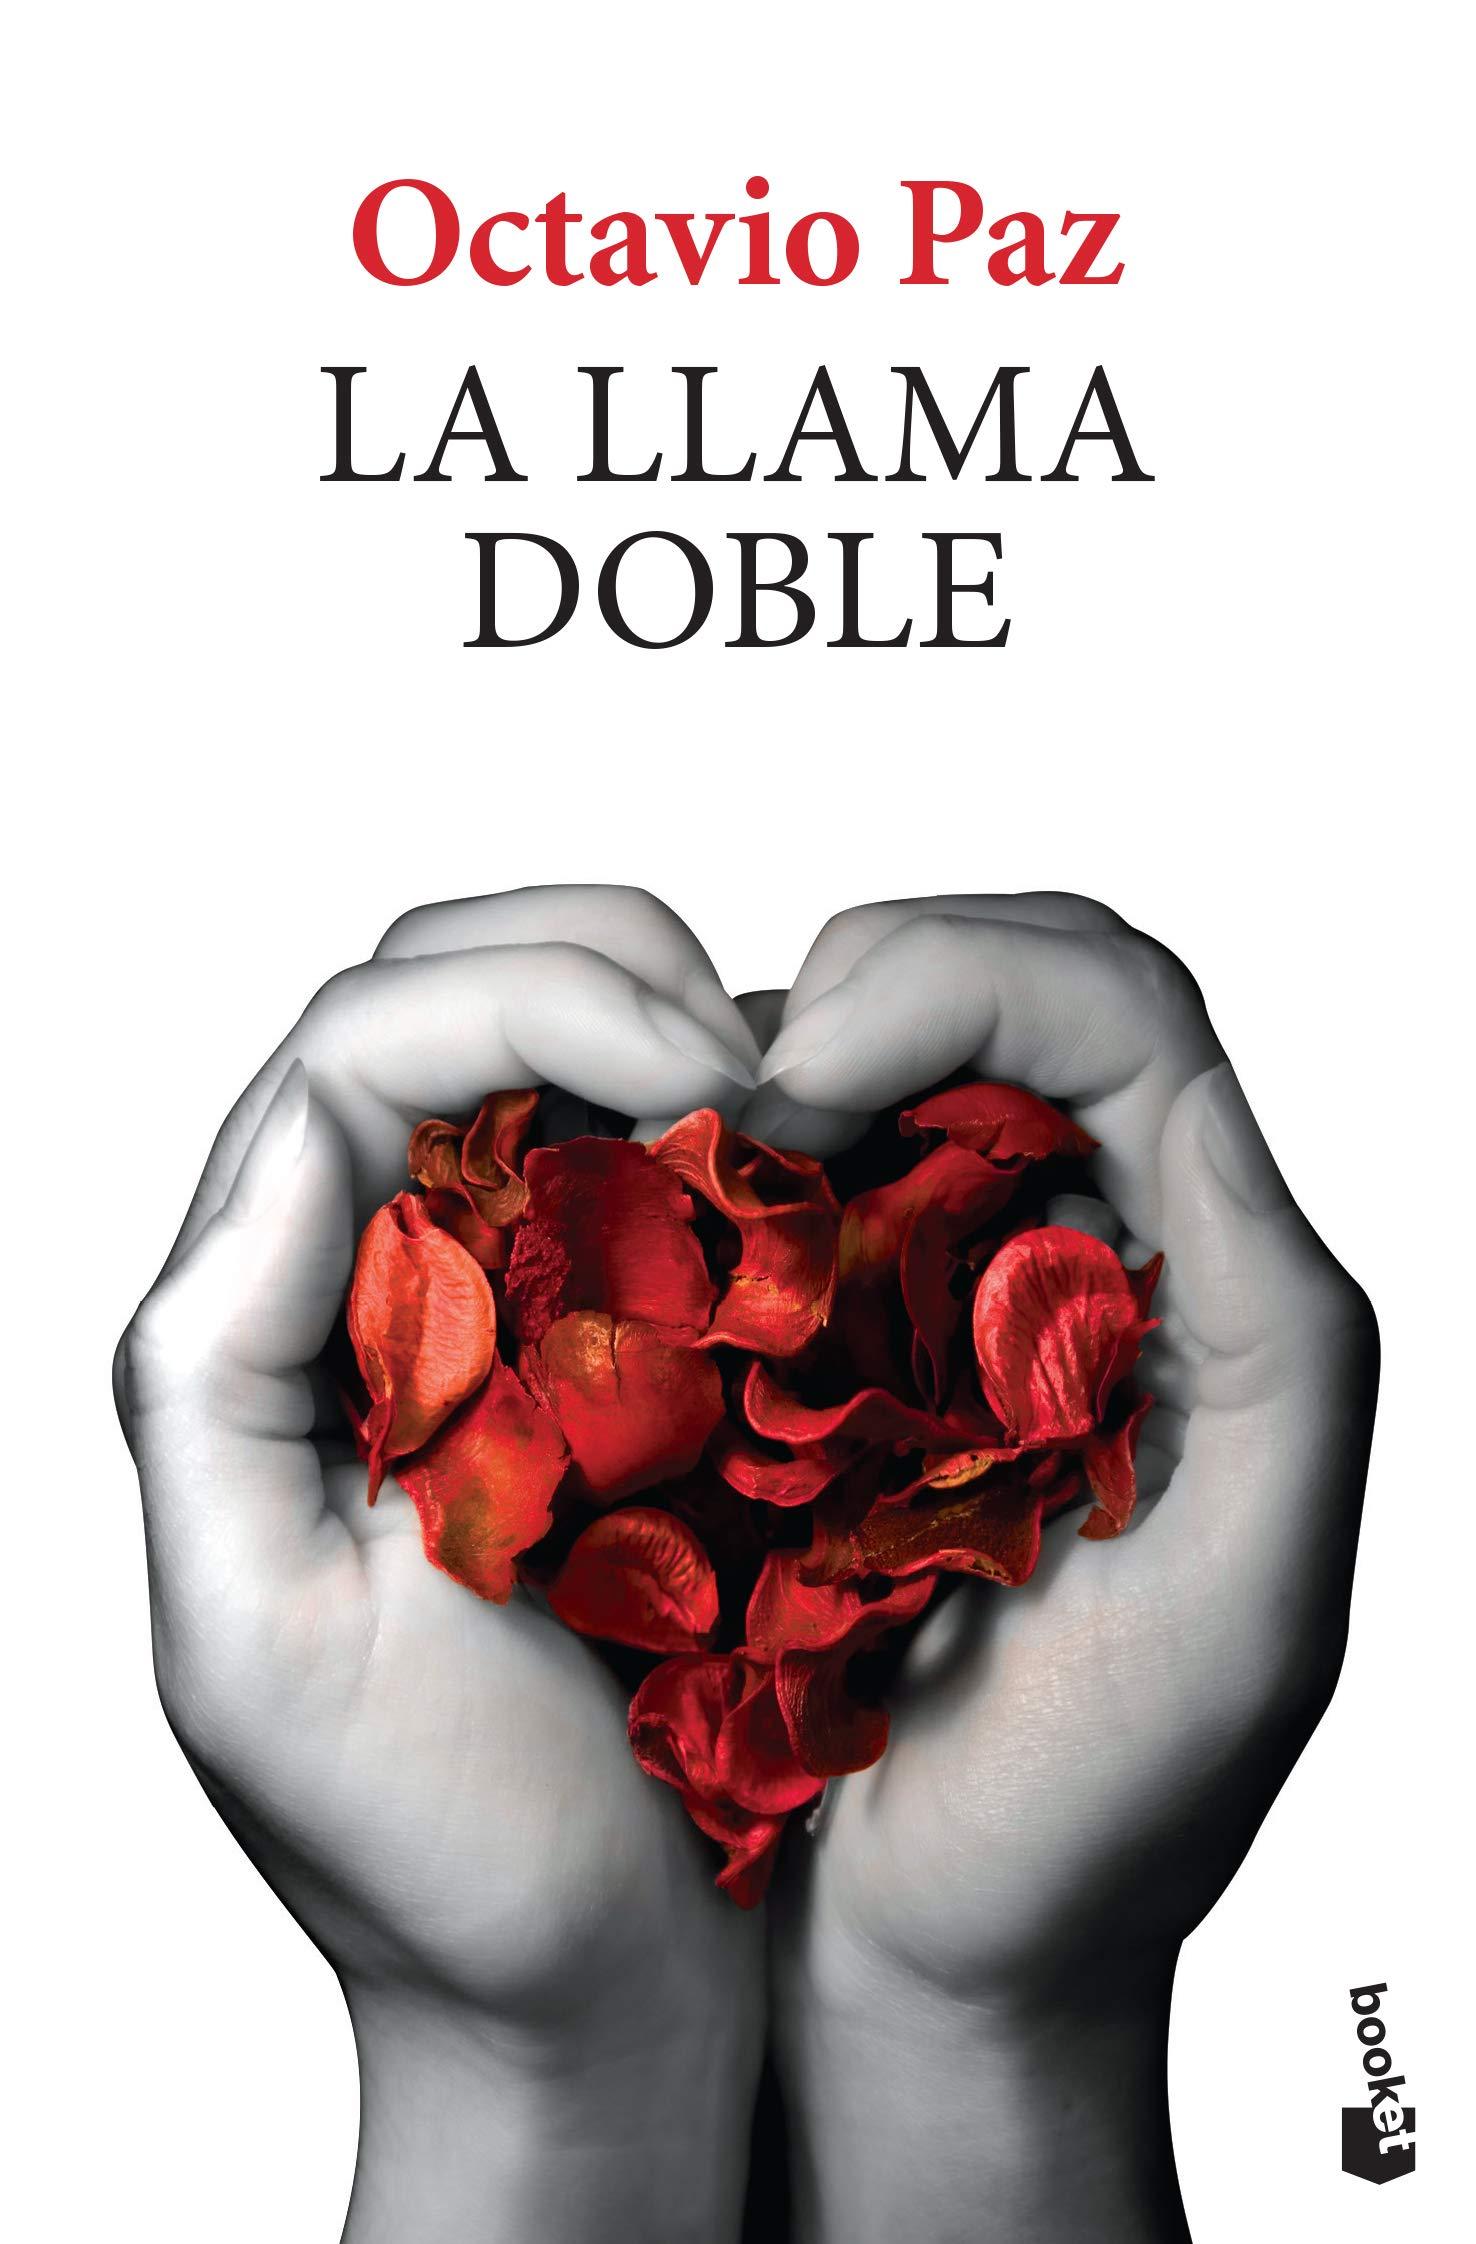 La llama doble (Spanish Edition): Octavio Paz: 9786070752841: Amazon.com: Books